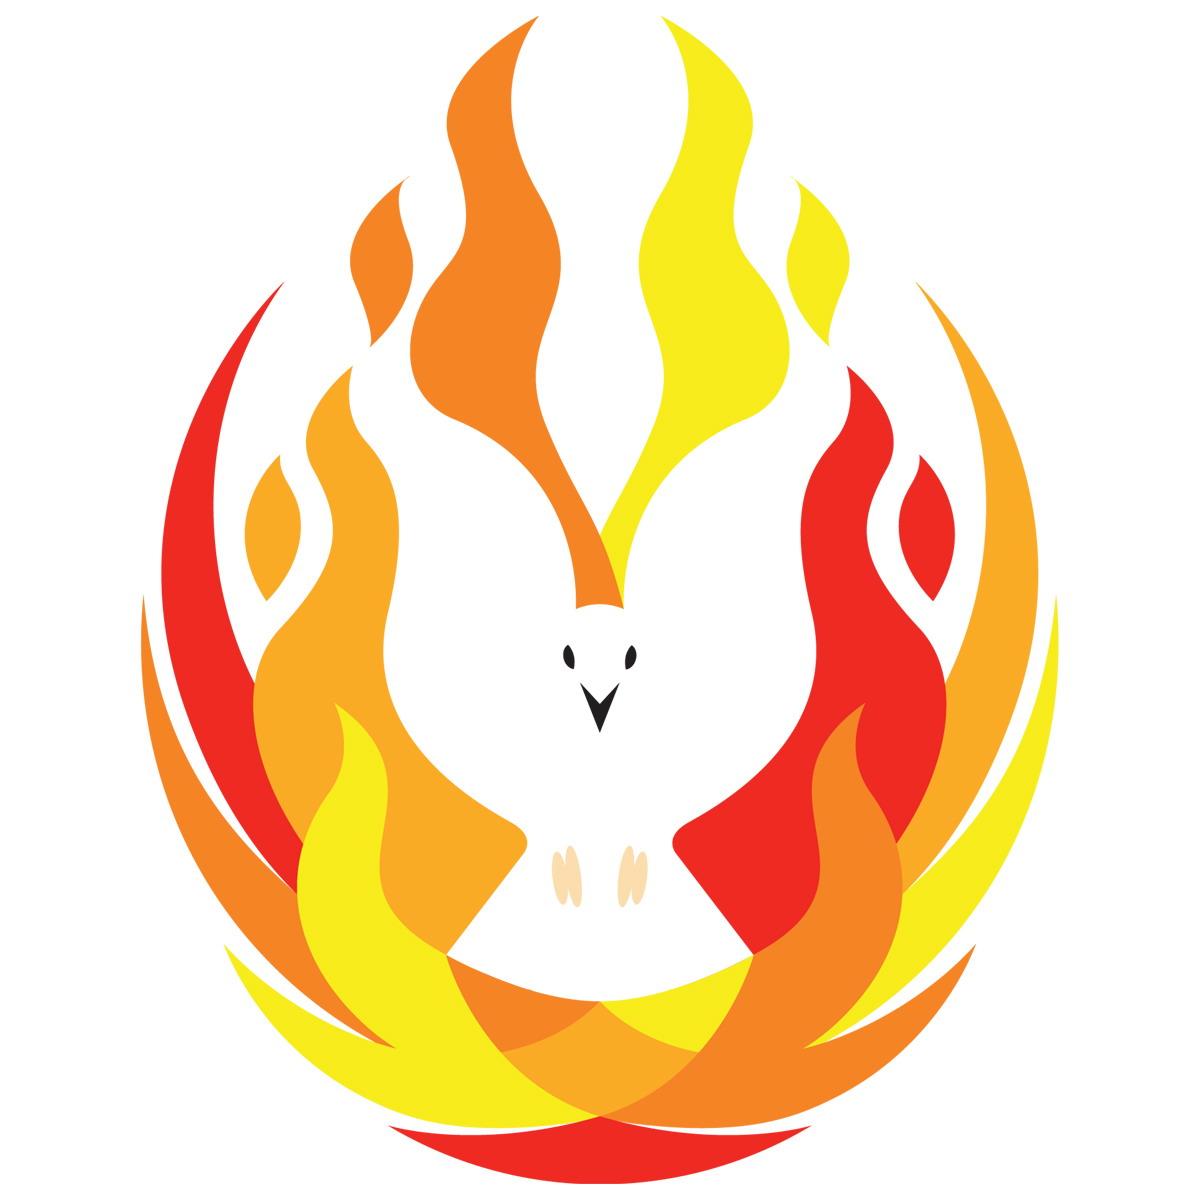 holy spirit dove clipart pentecost fire dove groton united church rh grotonucc org holy spirit dove clip art free holy spirit cliparts